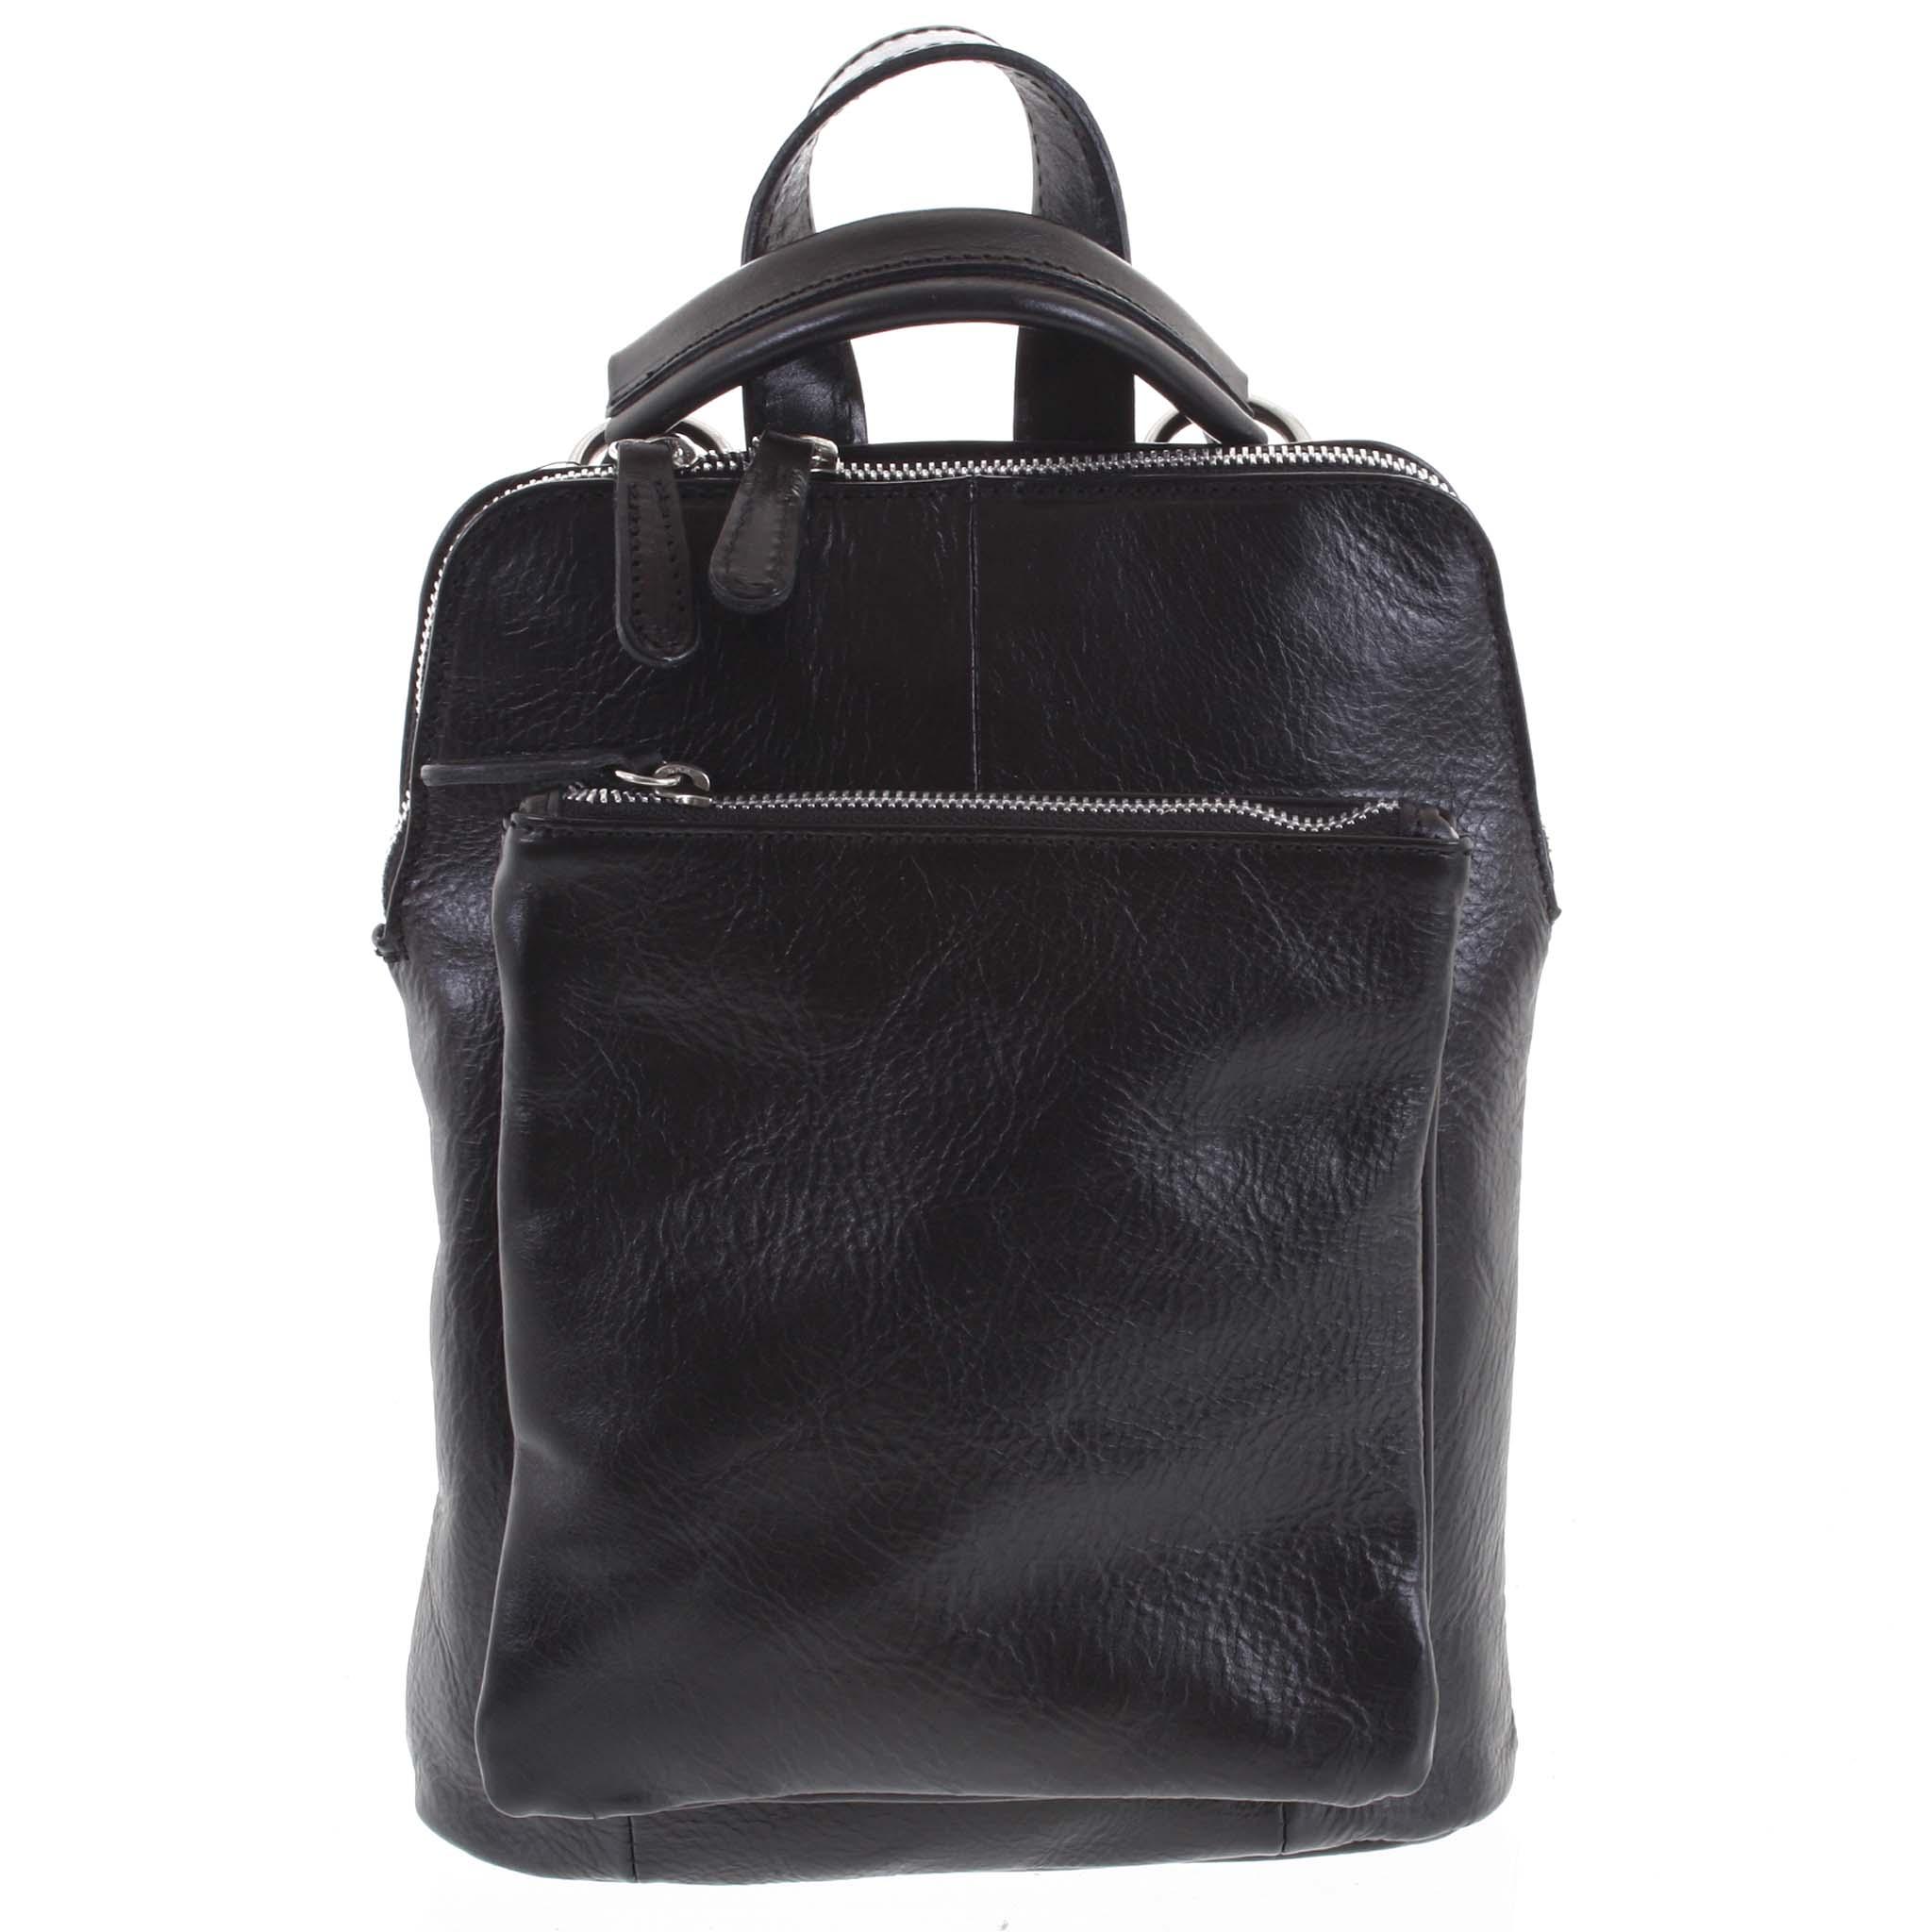 Dámský kožený batůžek kabelka černý - ItalY Englis černá